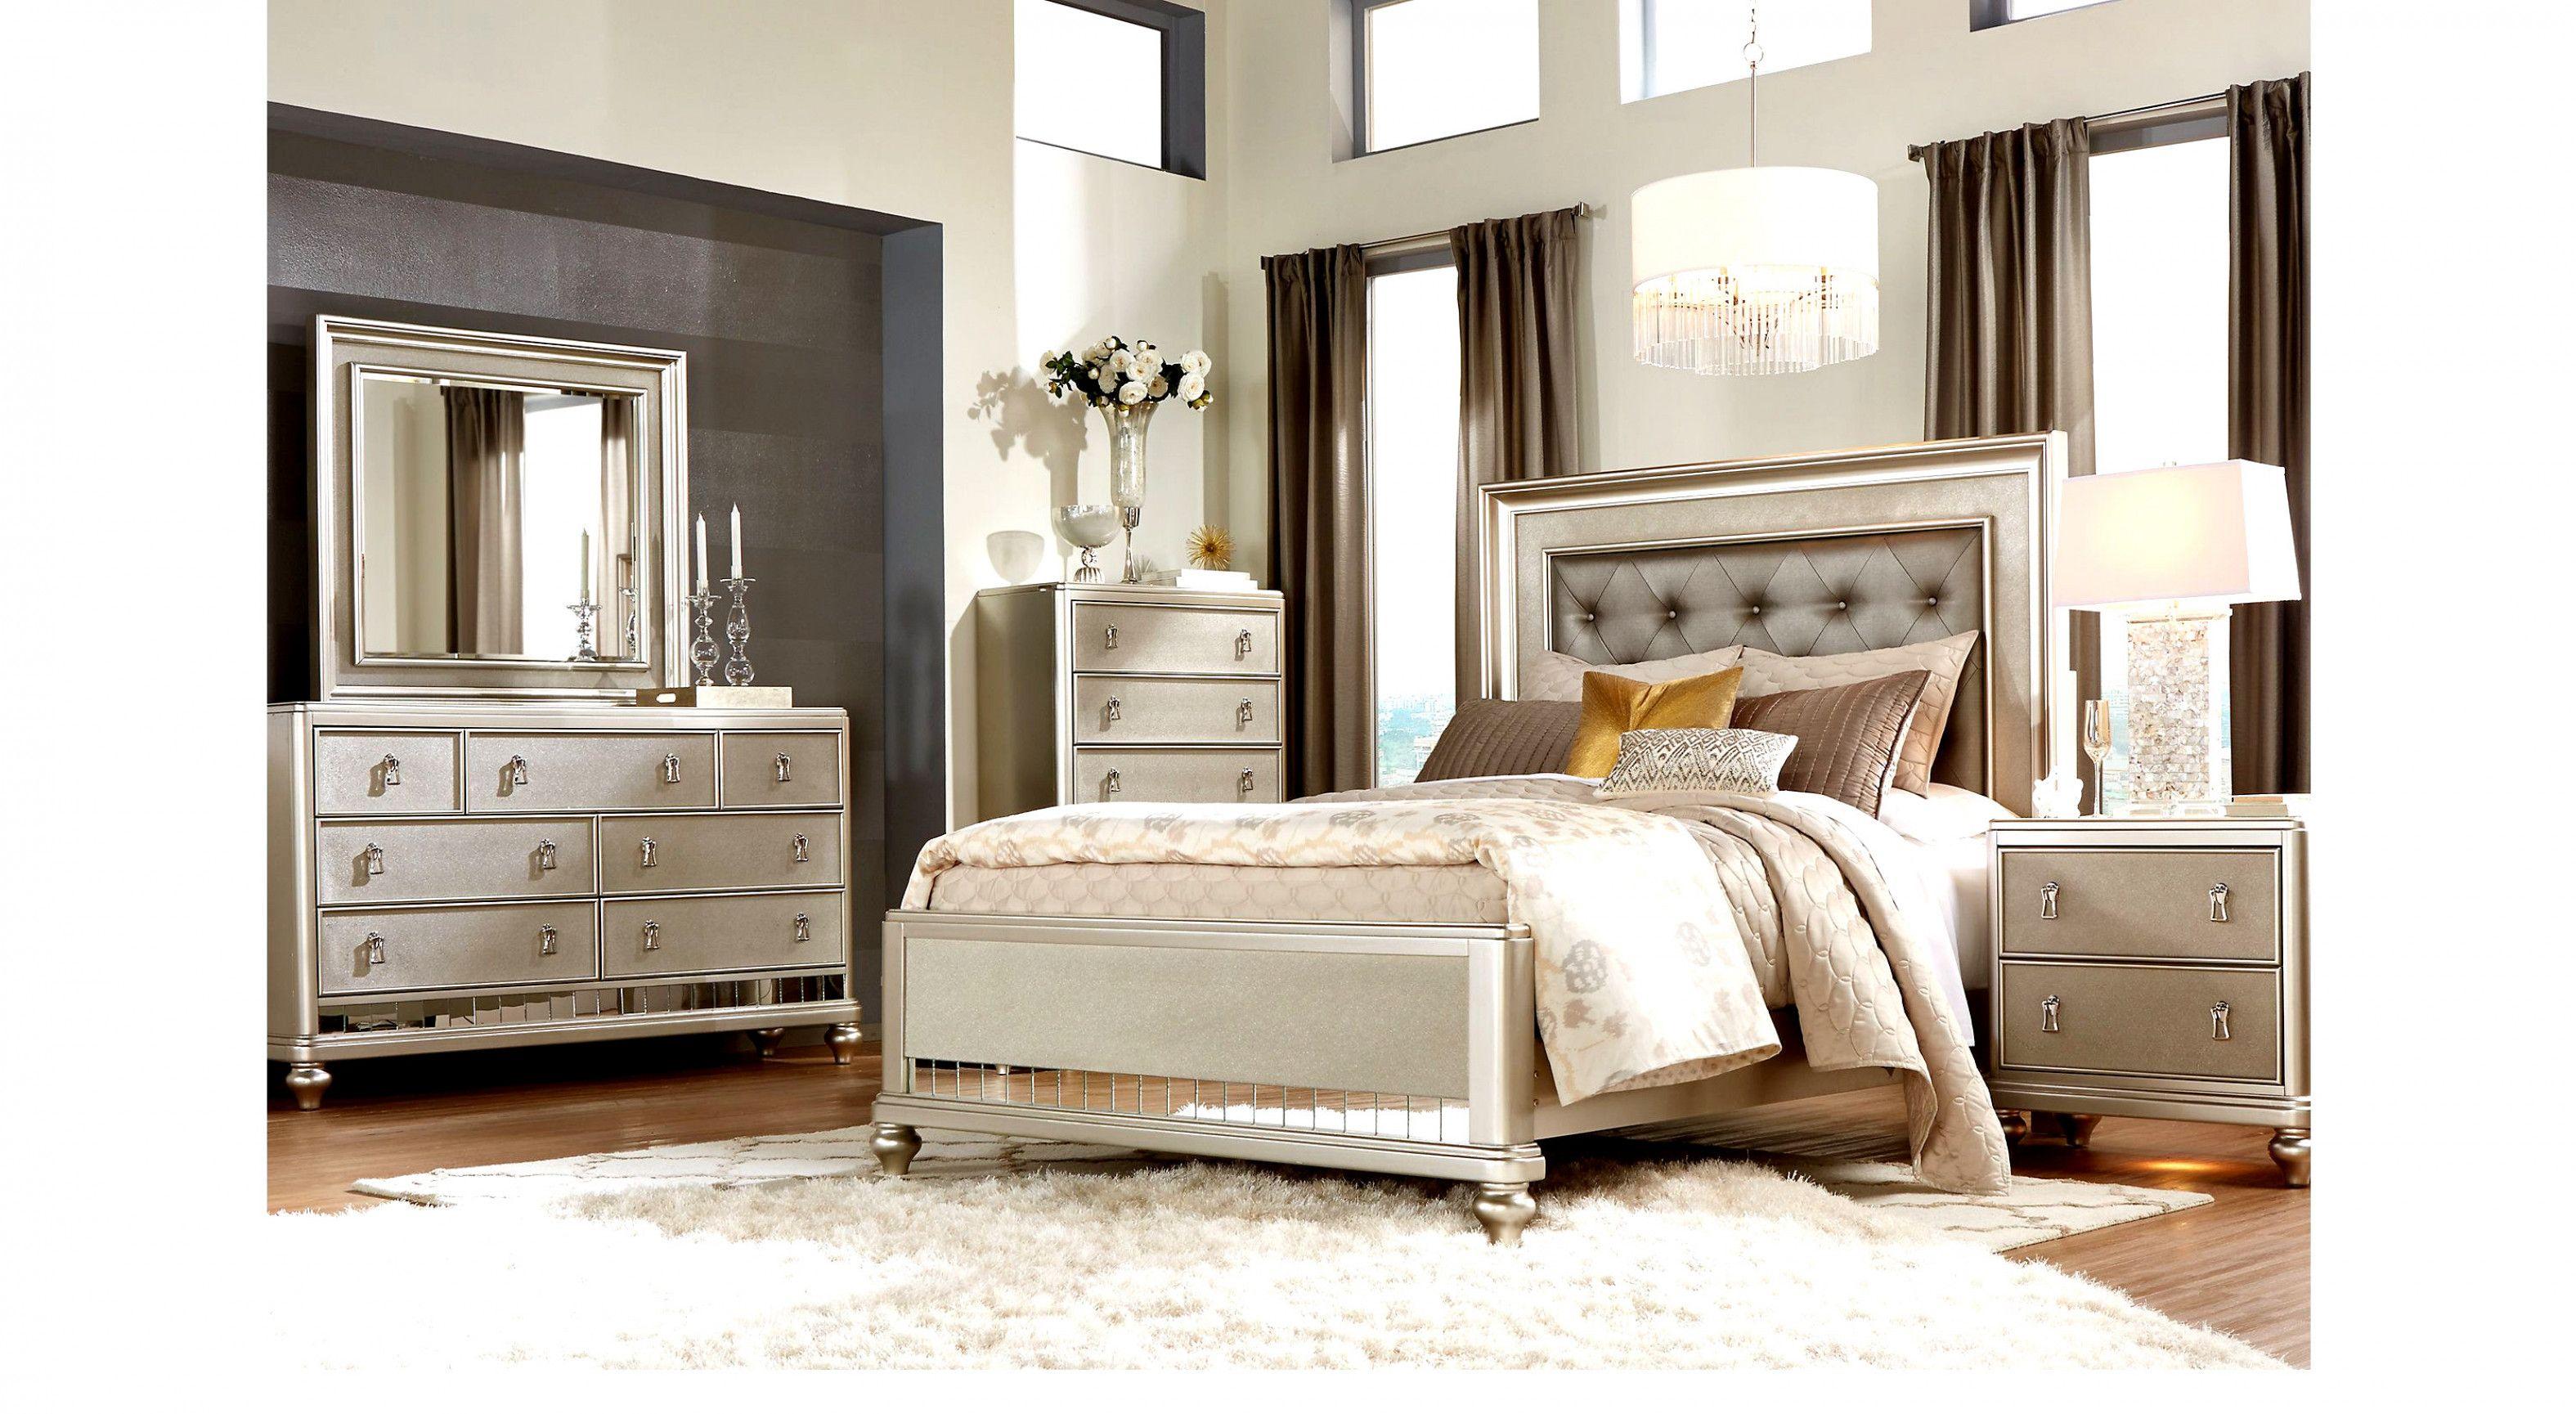 840 Queen Bedroom Sets On Sale Cheap Best HD